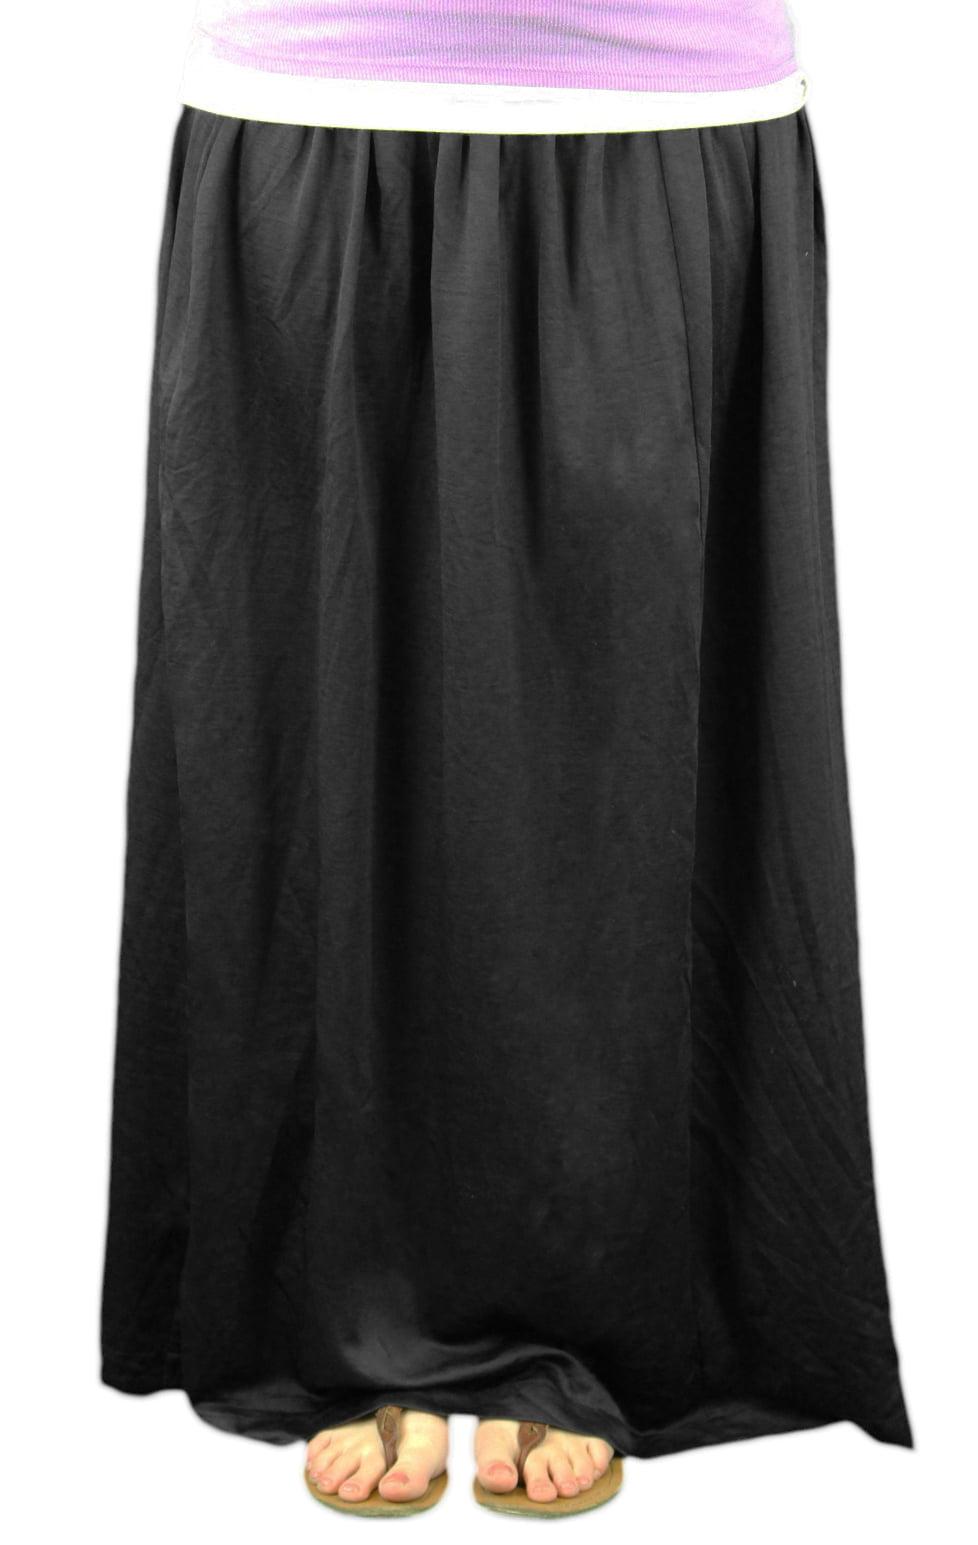 9 FASHION Maternity Orina Black Satin Finish Maxi Skirt Sz S by 9 Fashion